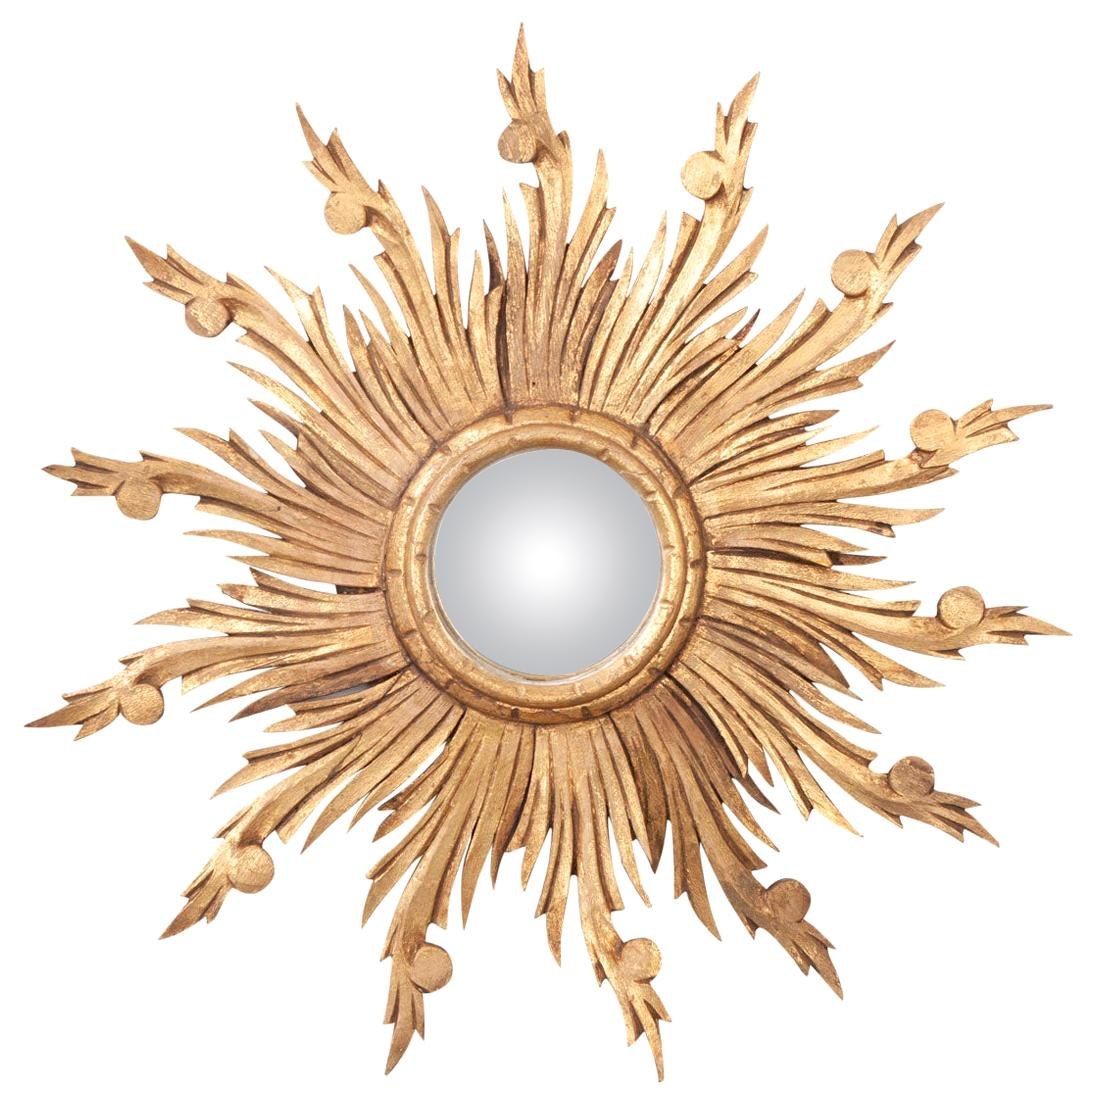 French 19th Century Gold Gilt Sunburst Convex Mirror